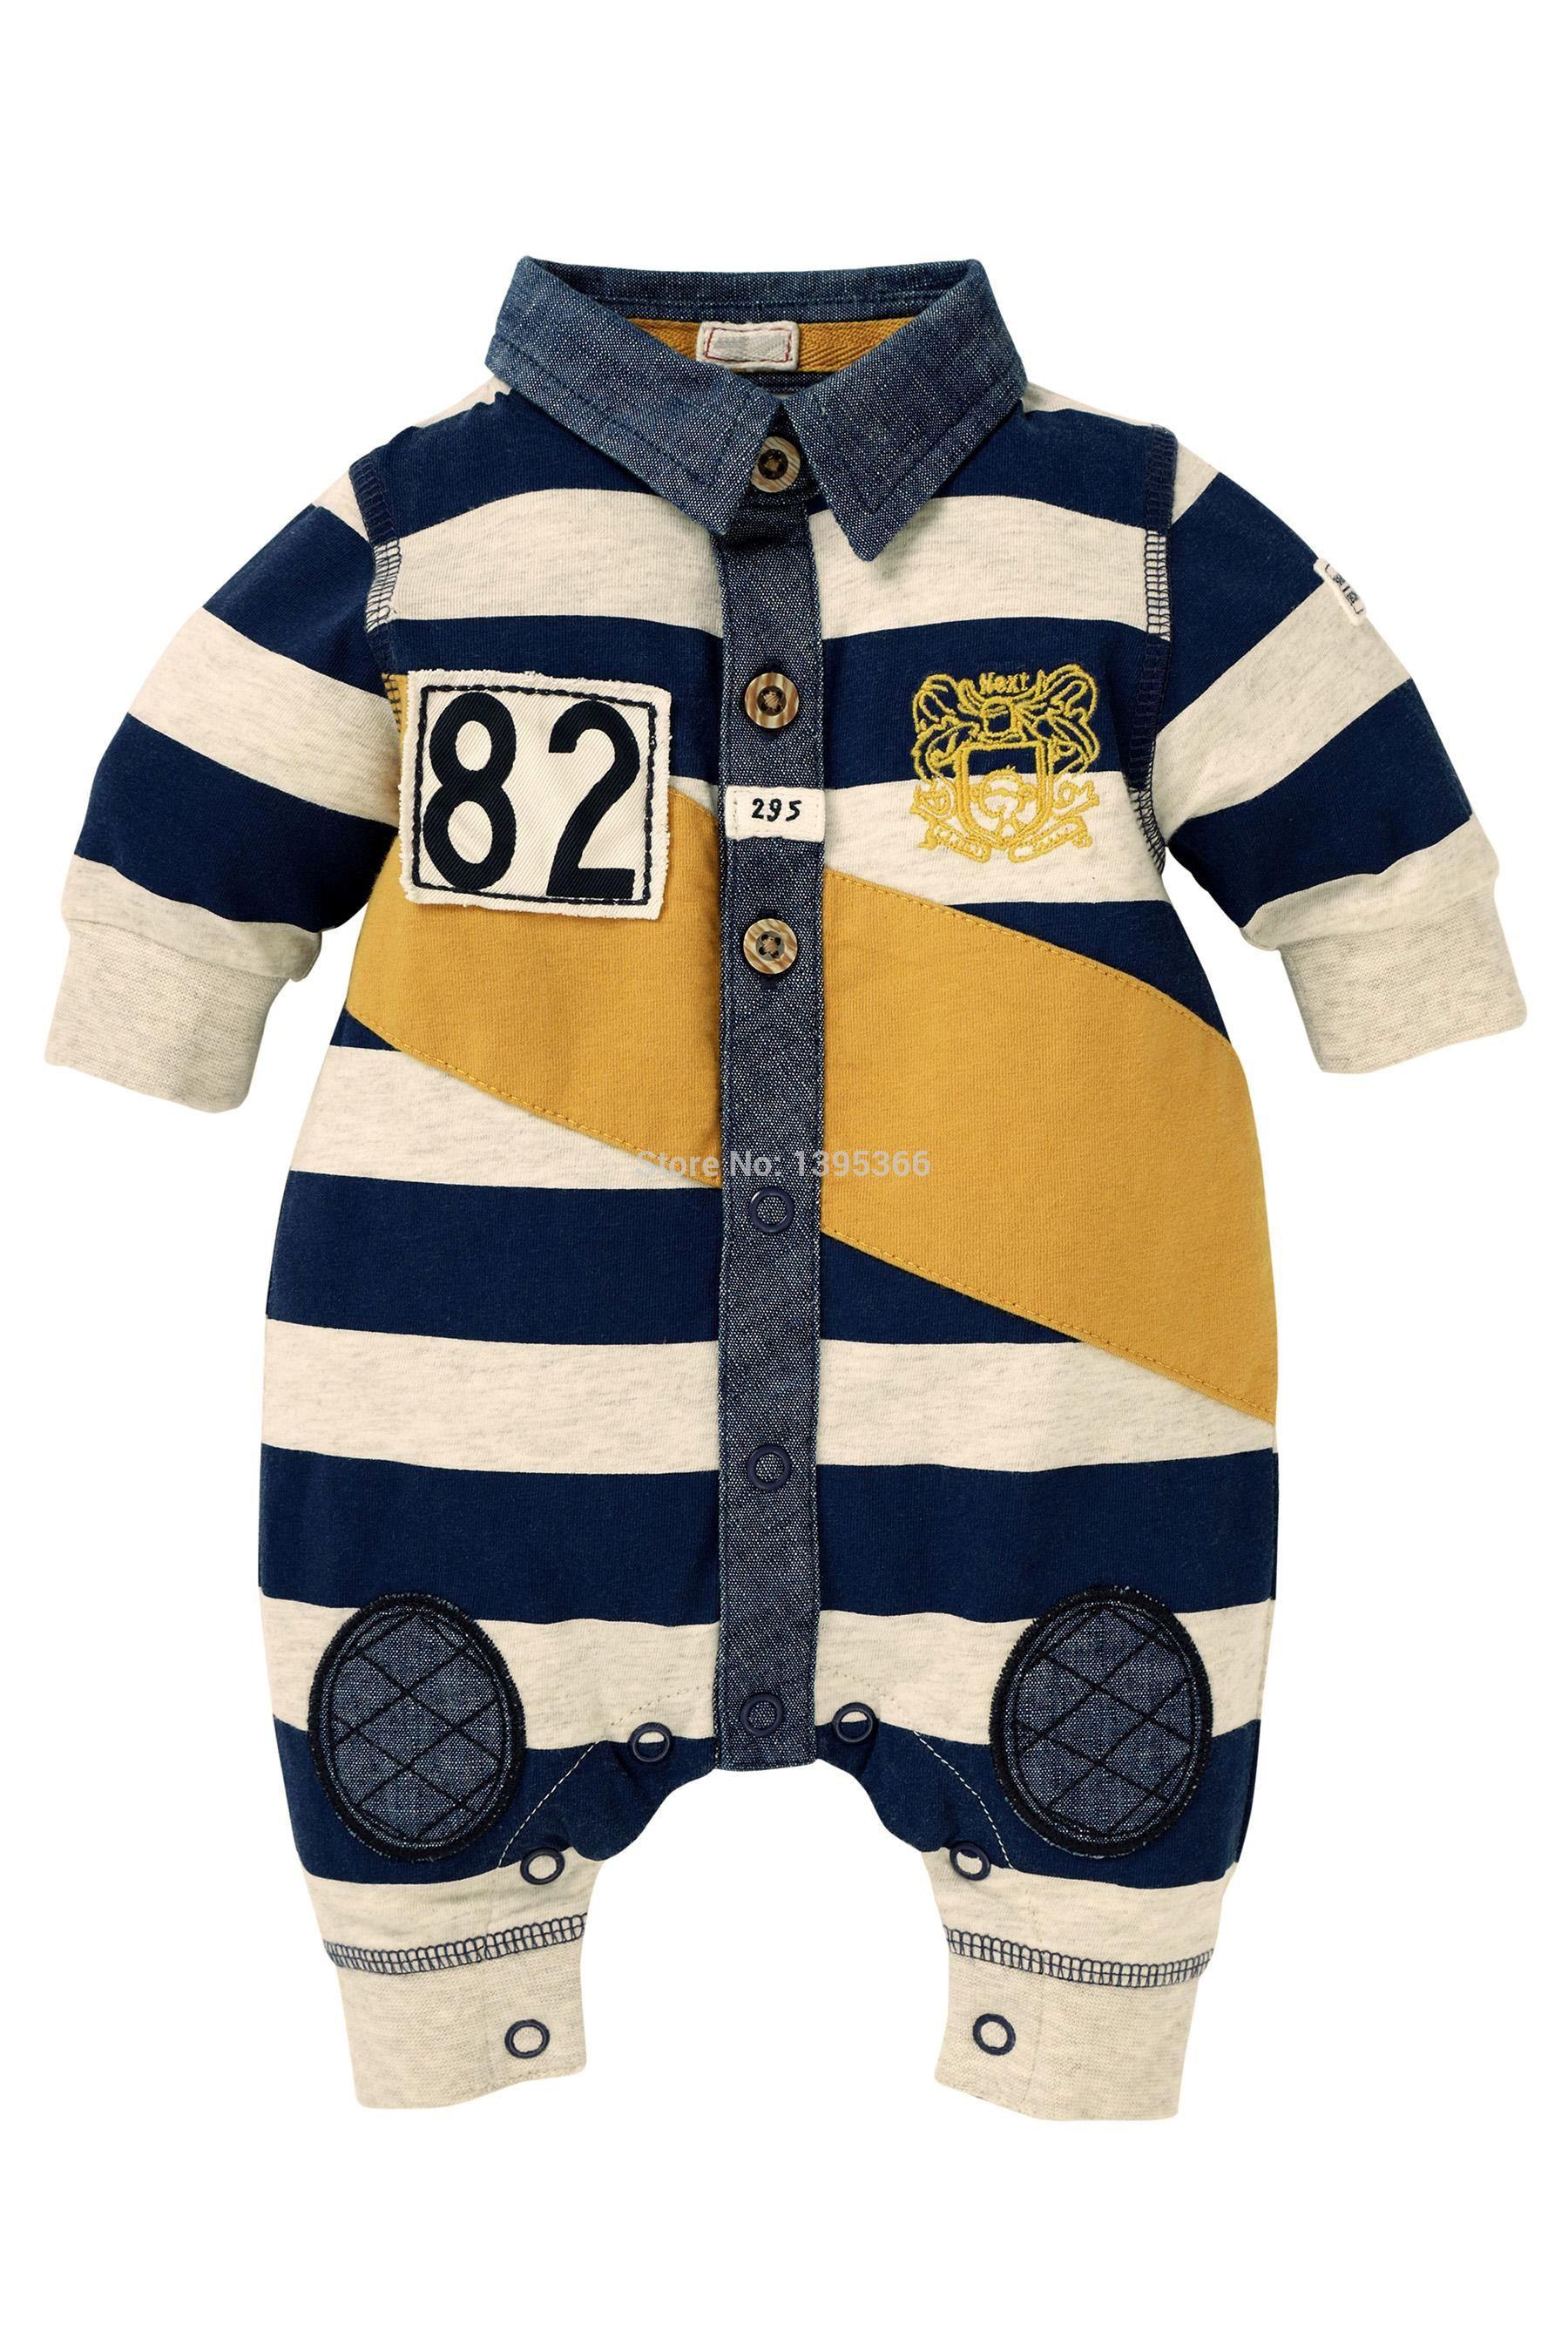 Newborn baby boy clothes next brand 100 cotton infant coveralls